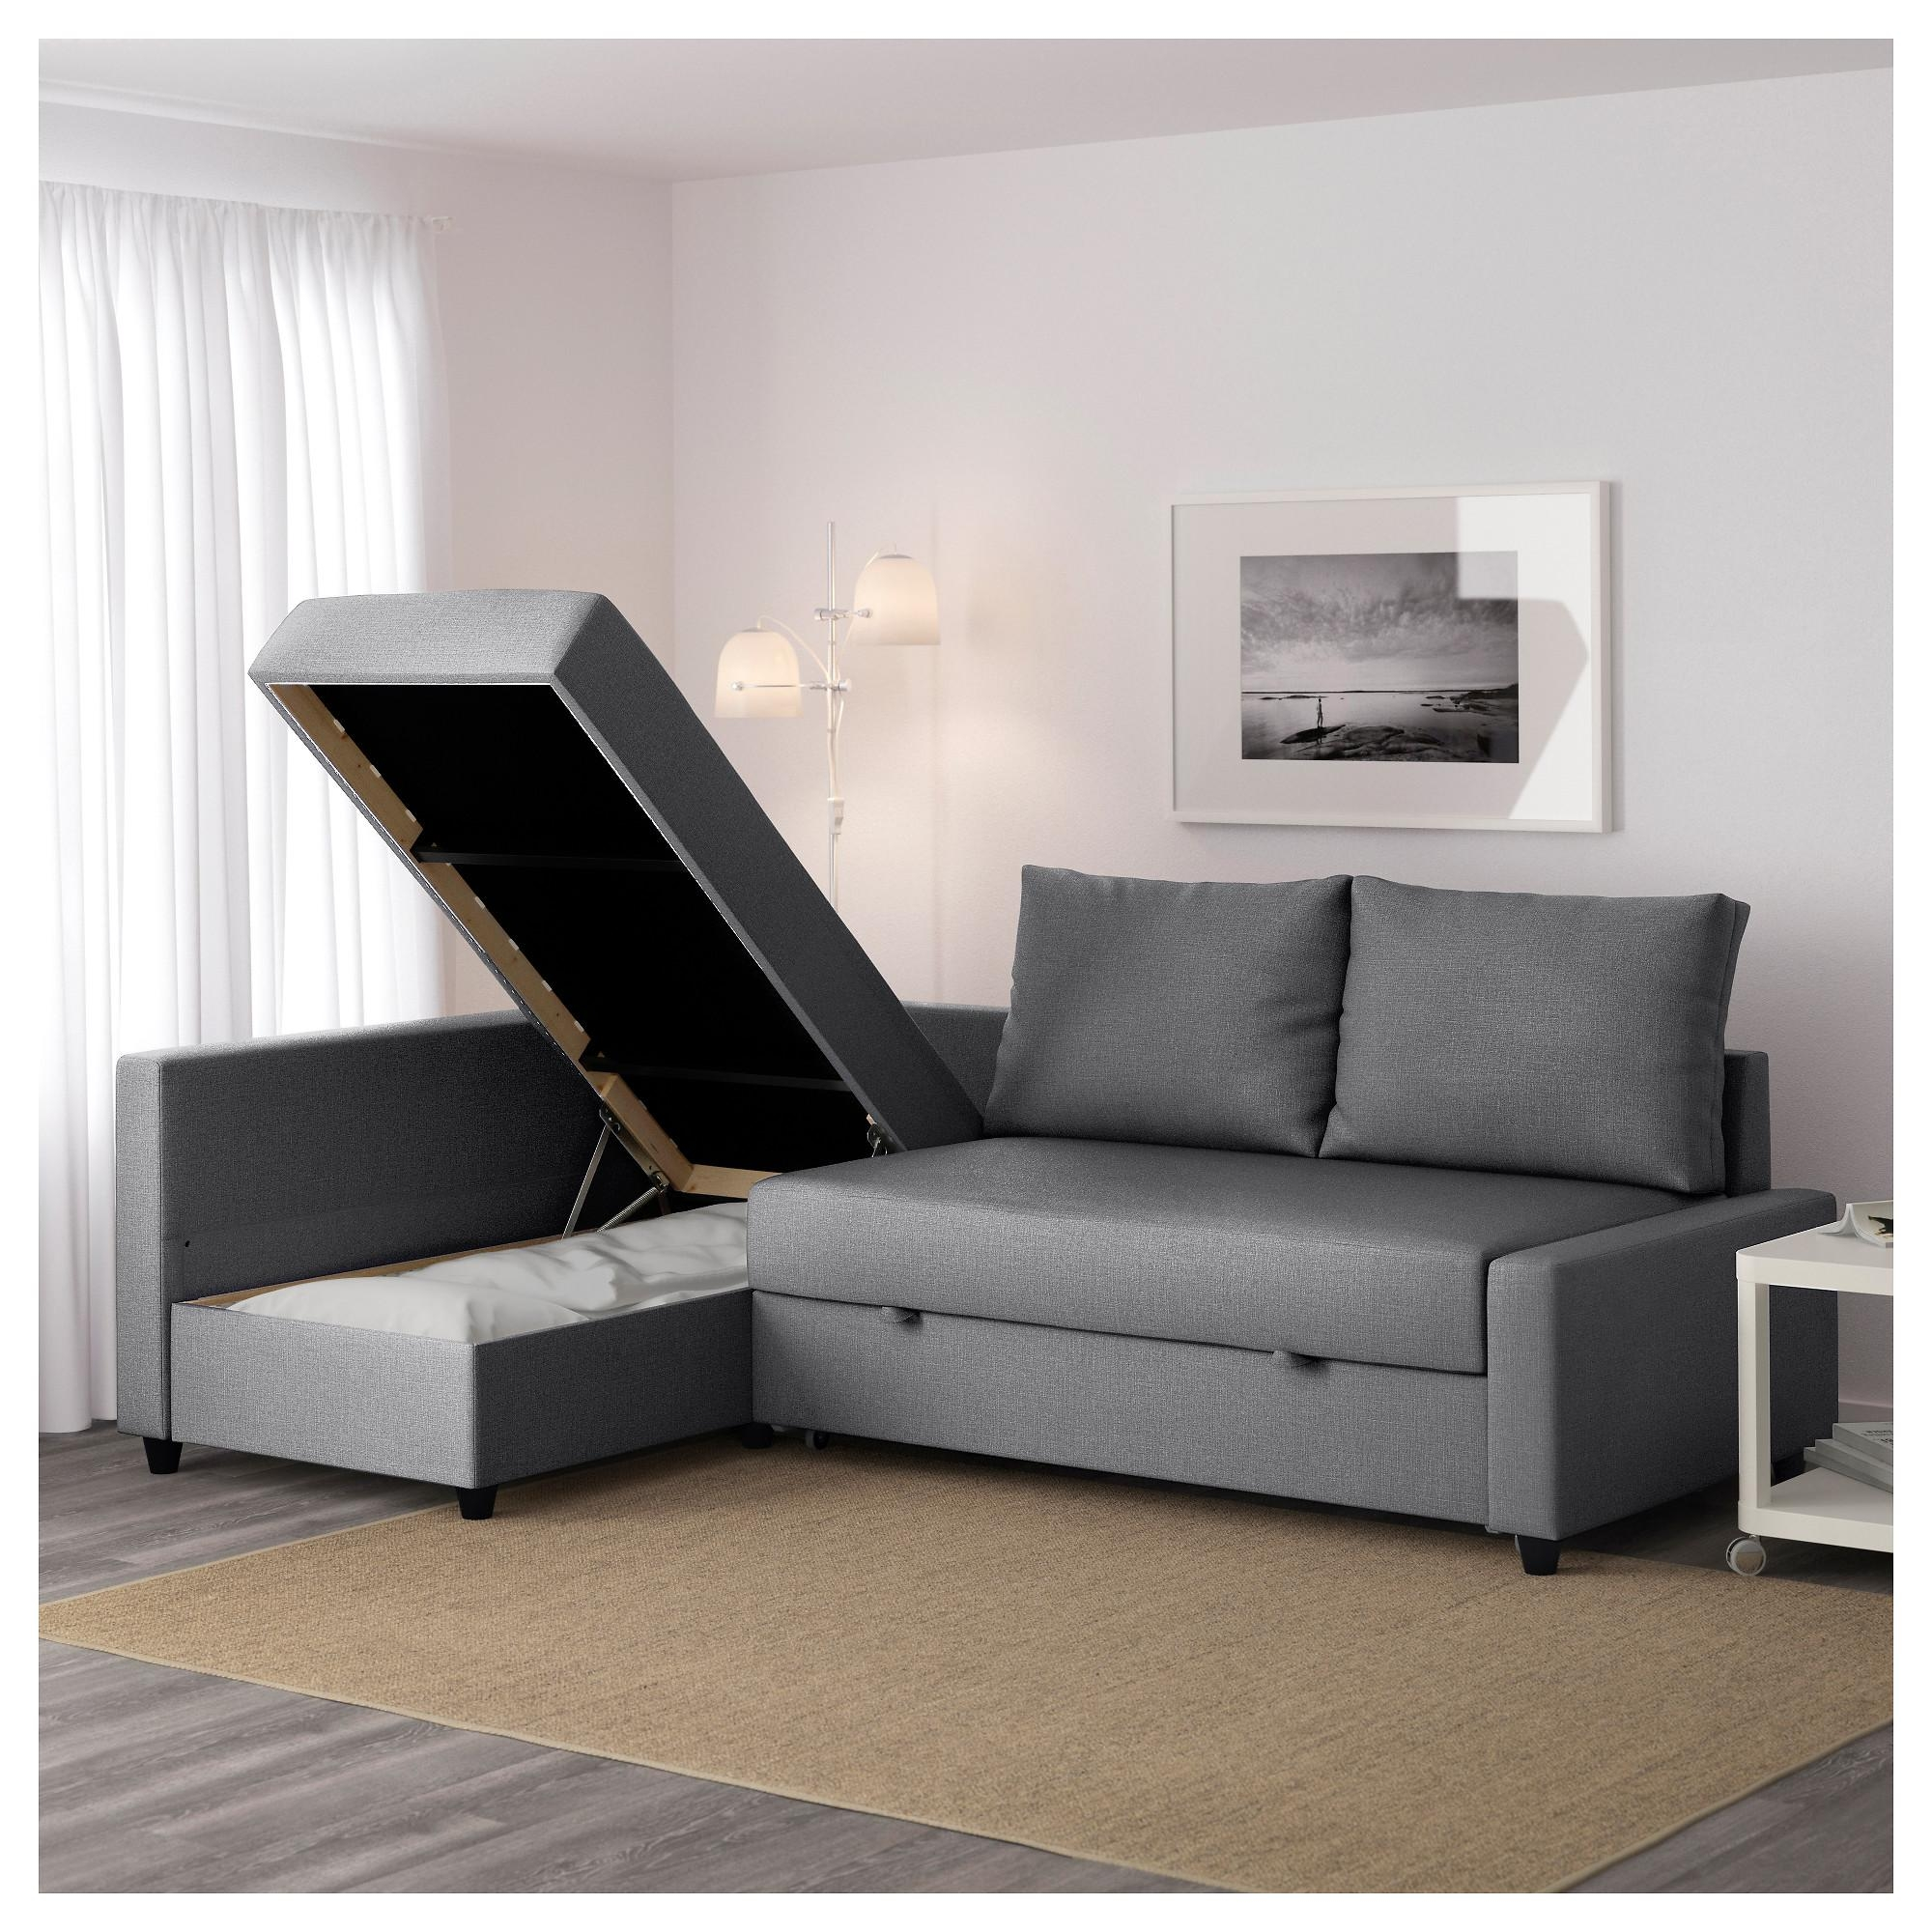 Furniture: Ikea Sofa Beds | Ikea Queen Sofa Bed | Ikea Sofa Bunk Bed For Queen Sofa Beds (Image 7 of 20)